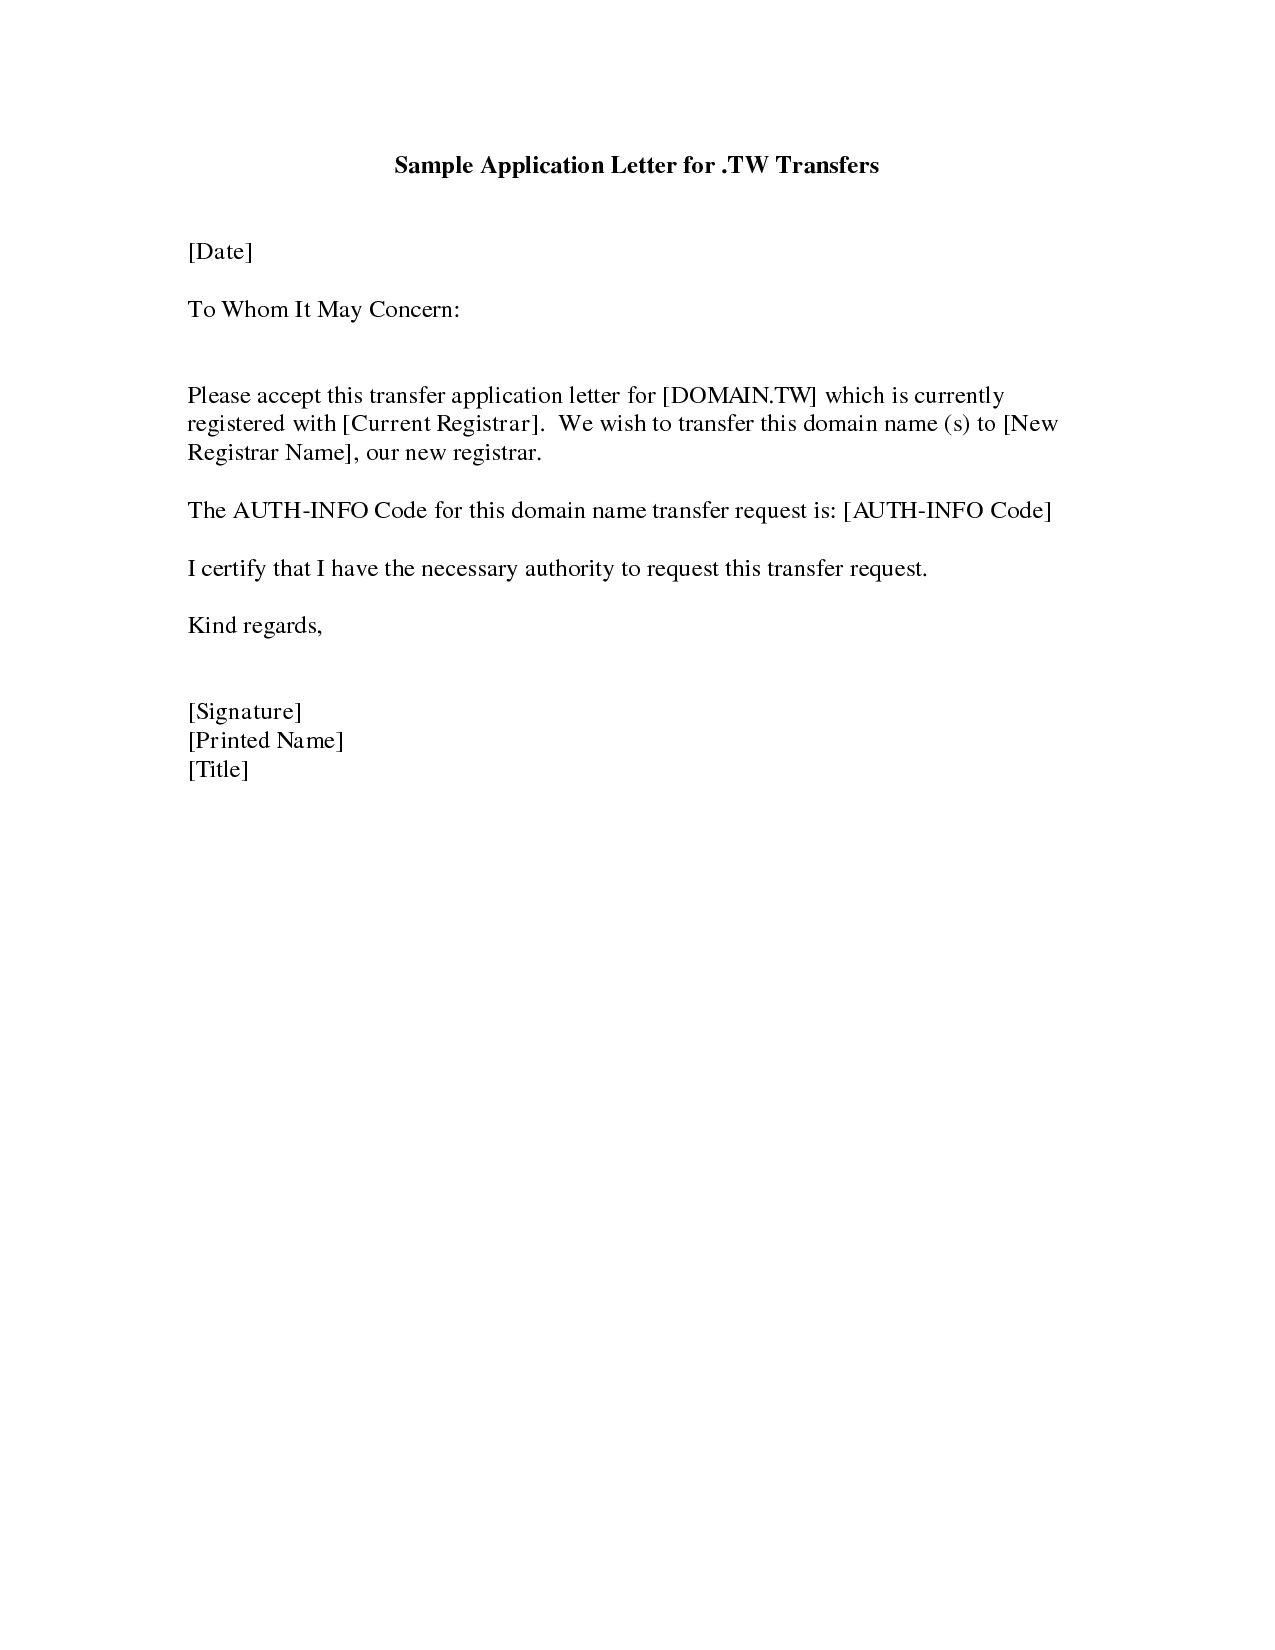 Simple Cover Letter Template Cover Letter Sample For Job Application